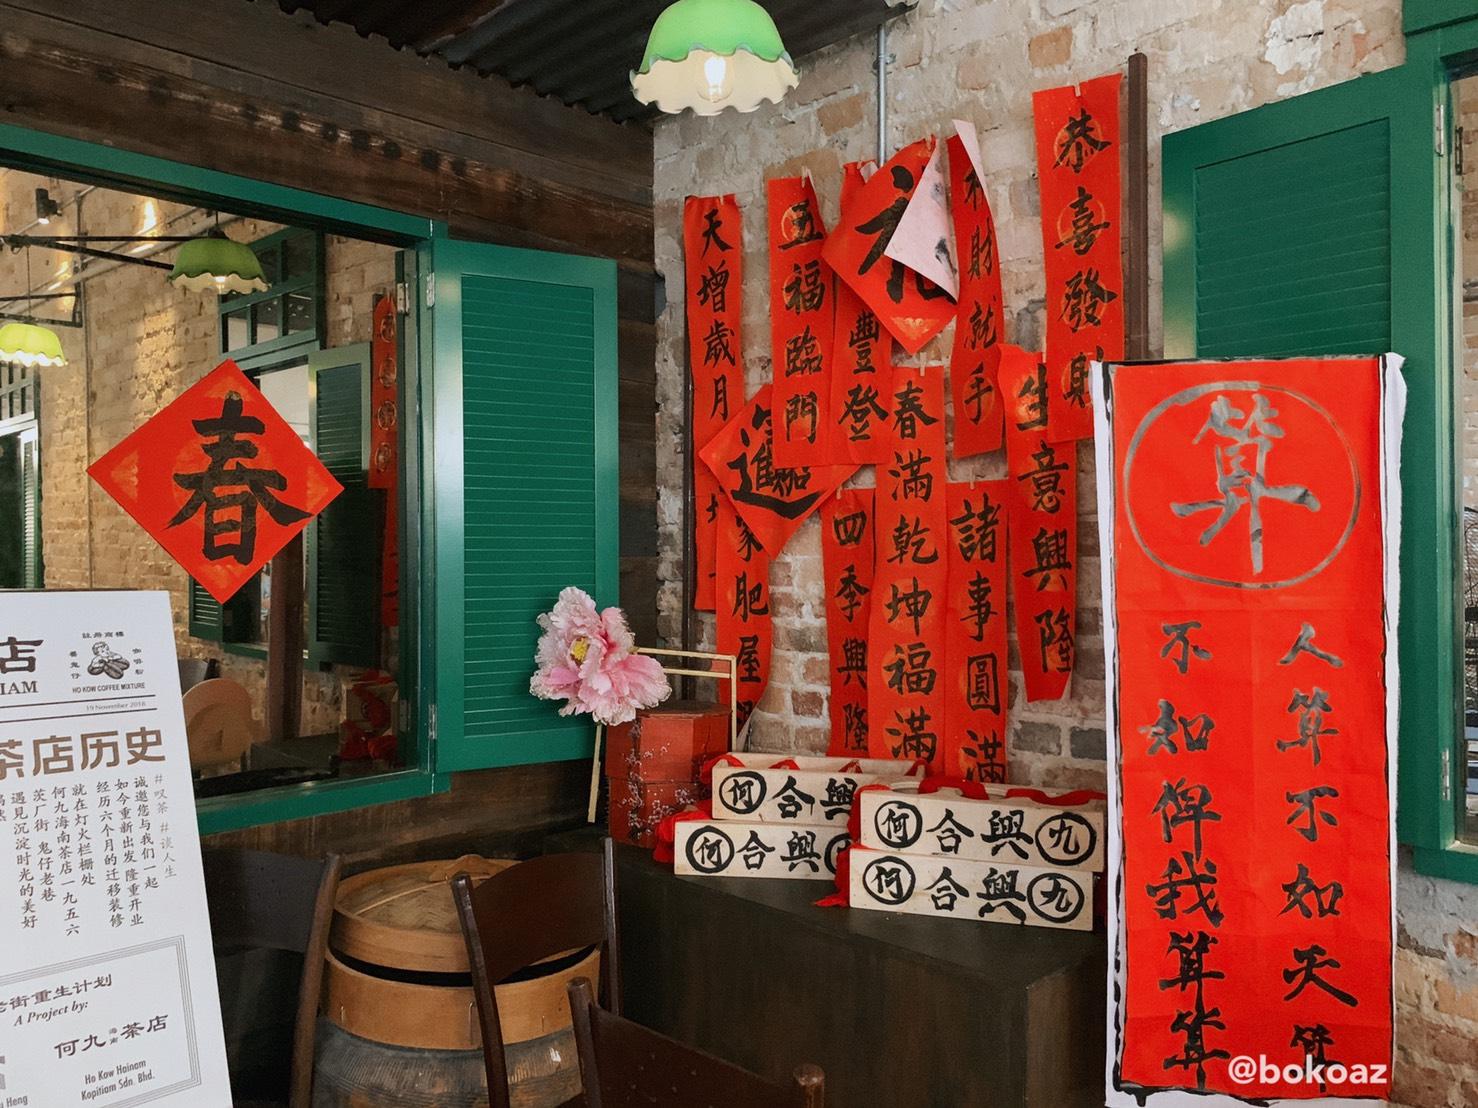 Kwan Chai Hong inside